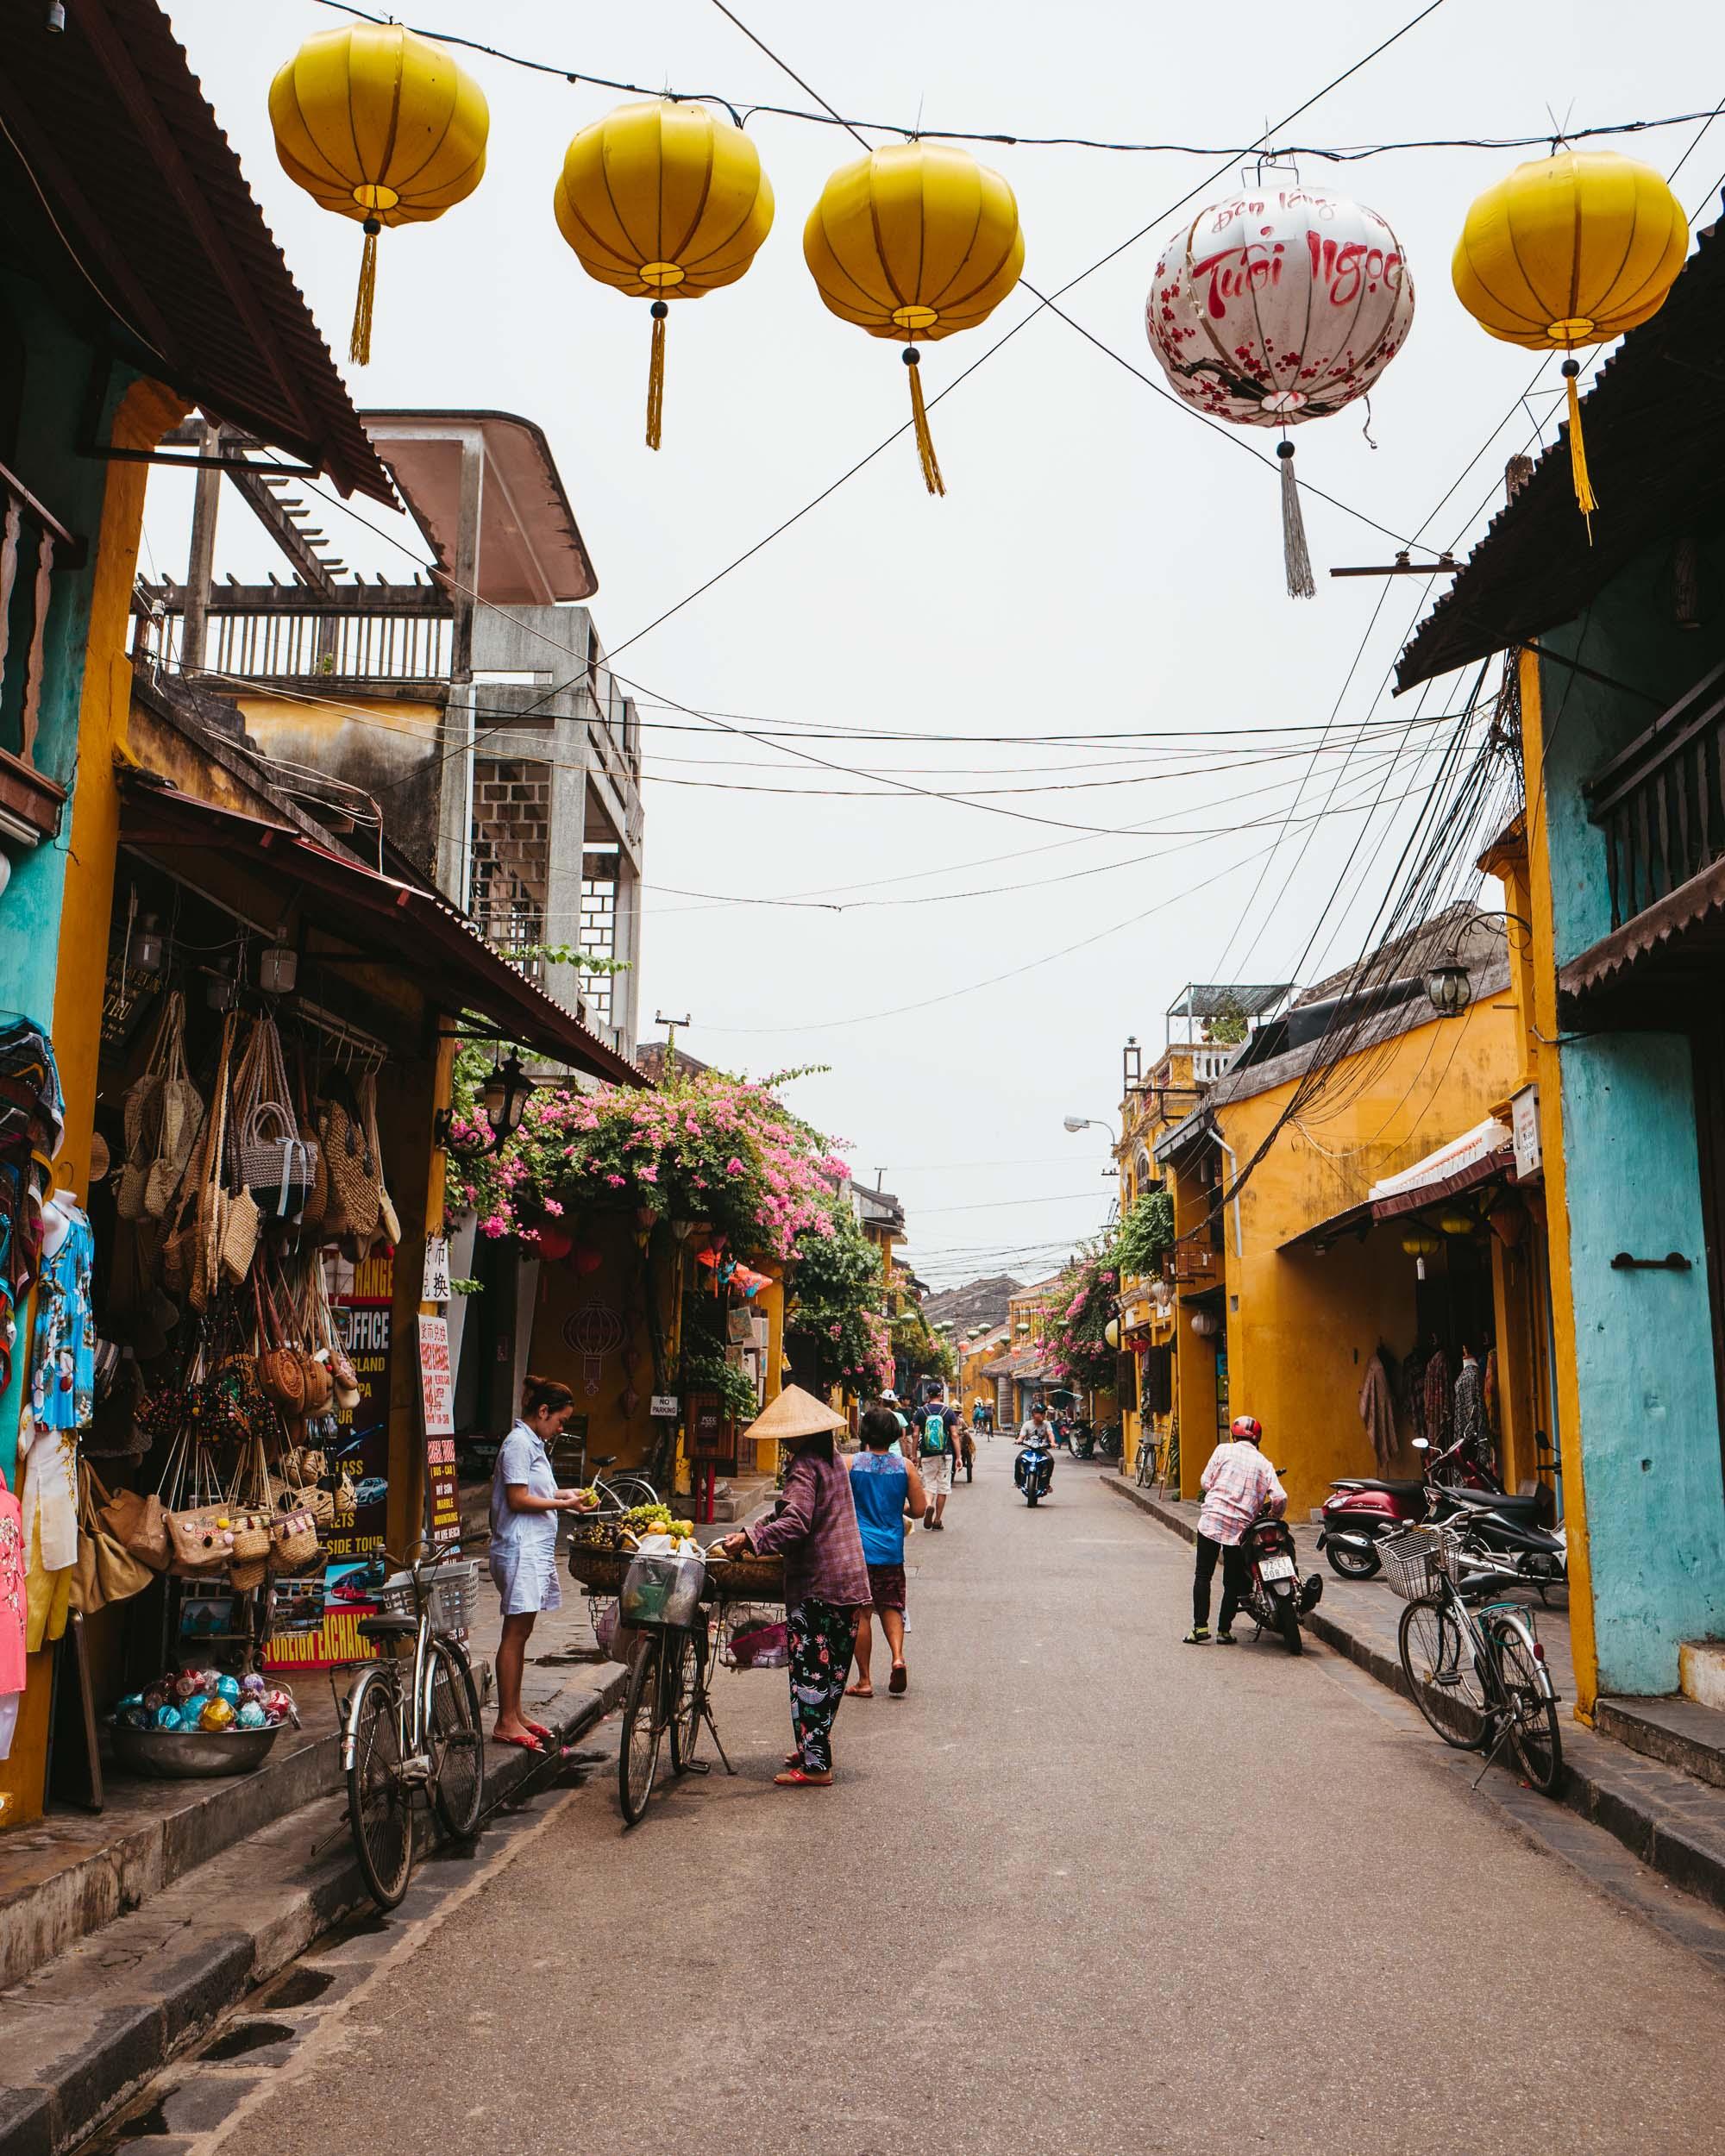 Street scenes in Hoi An Vietnam